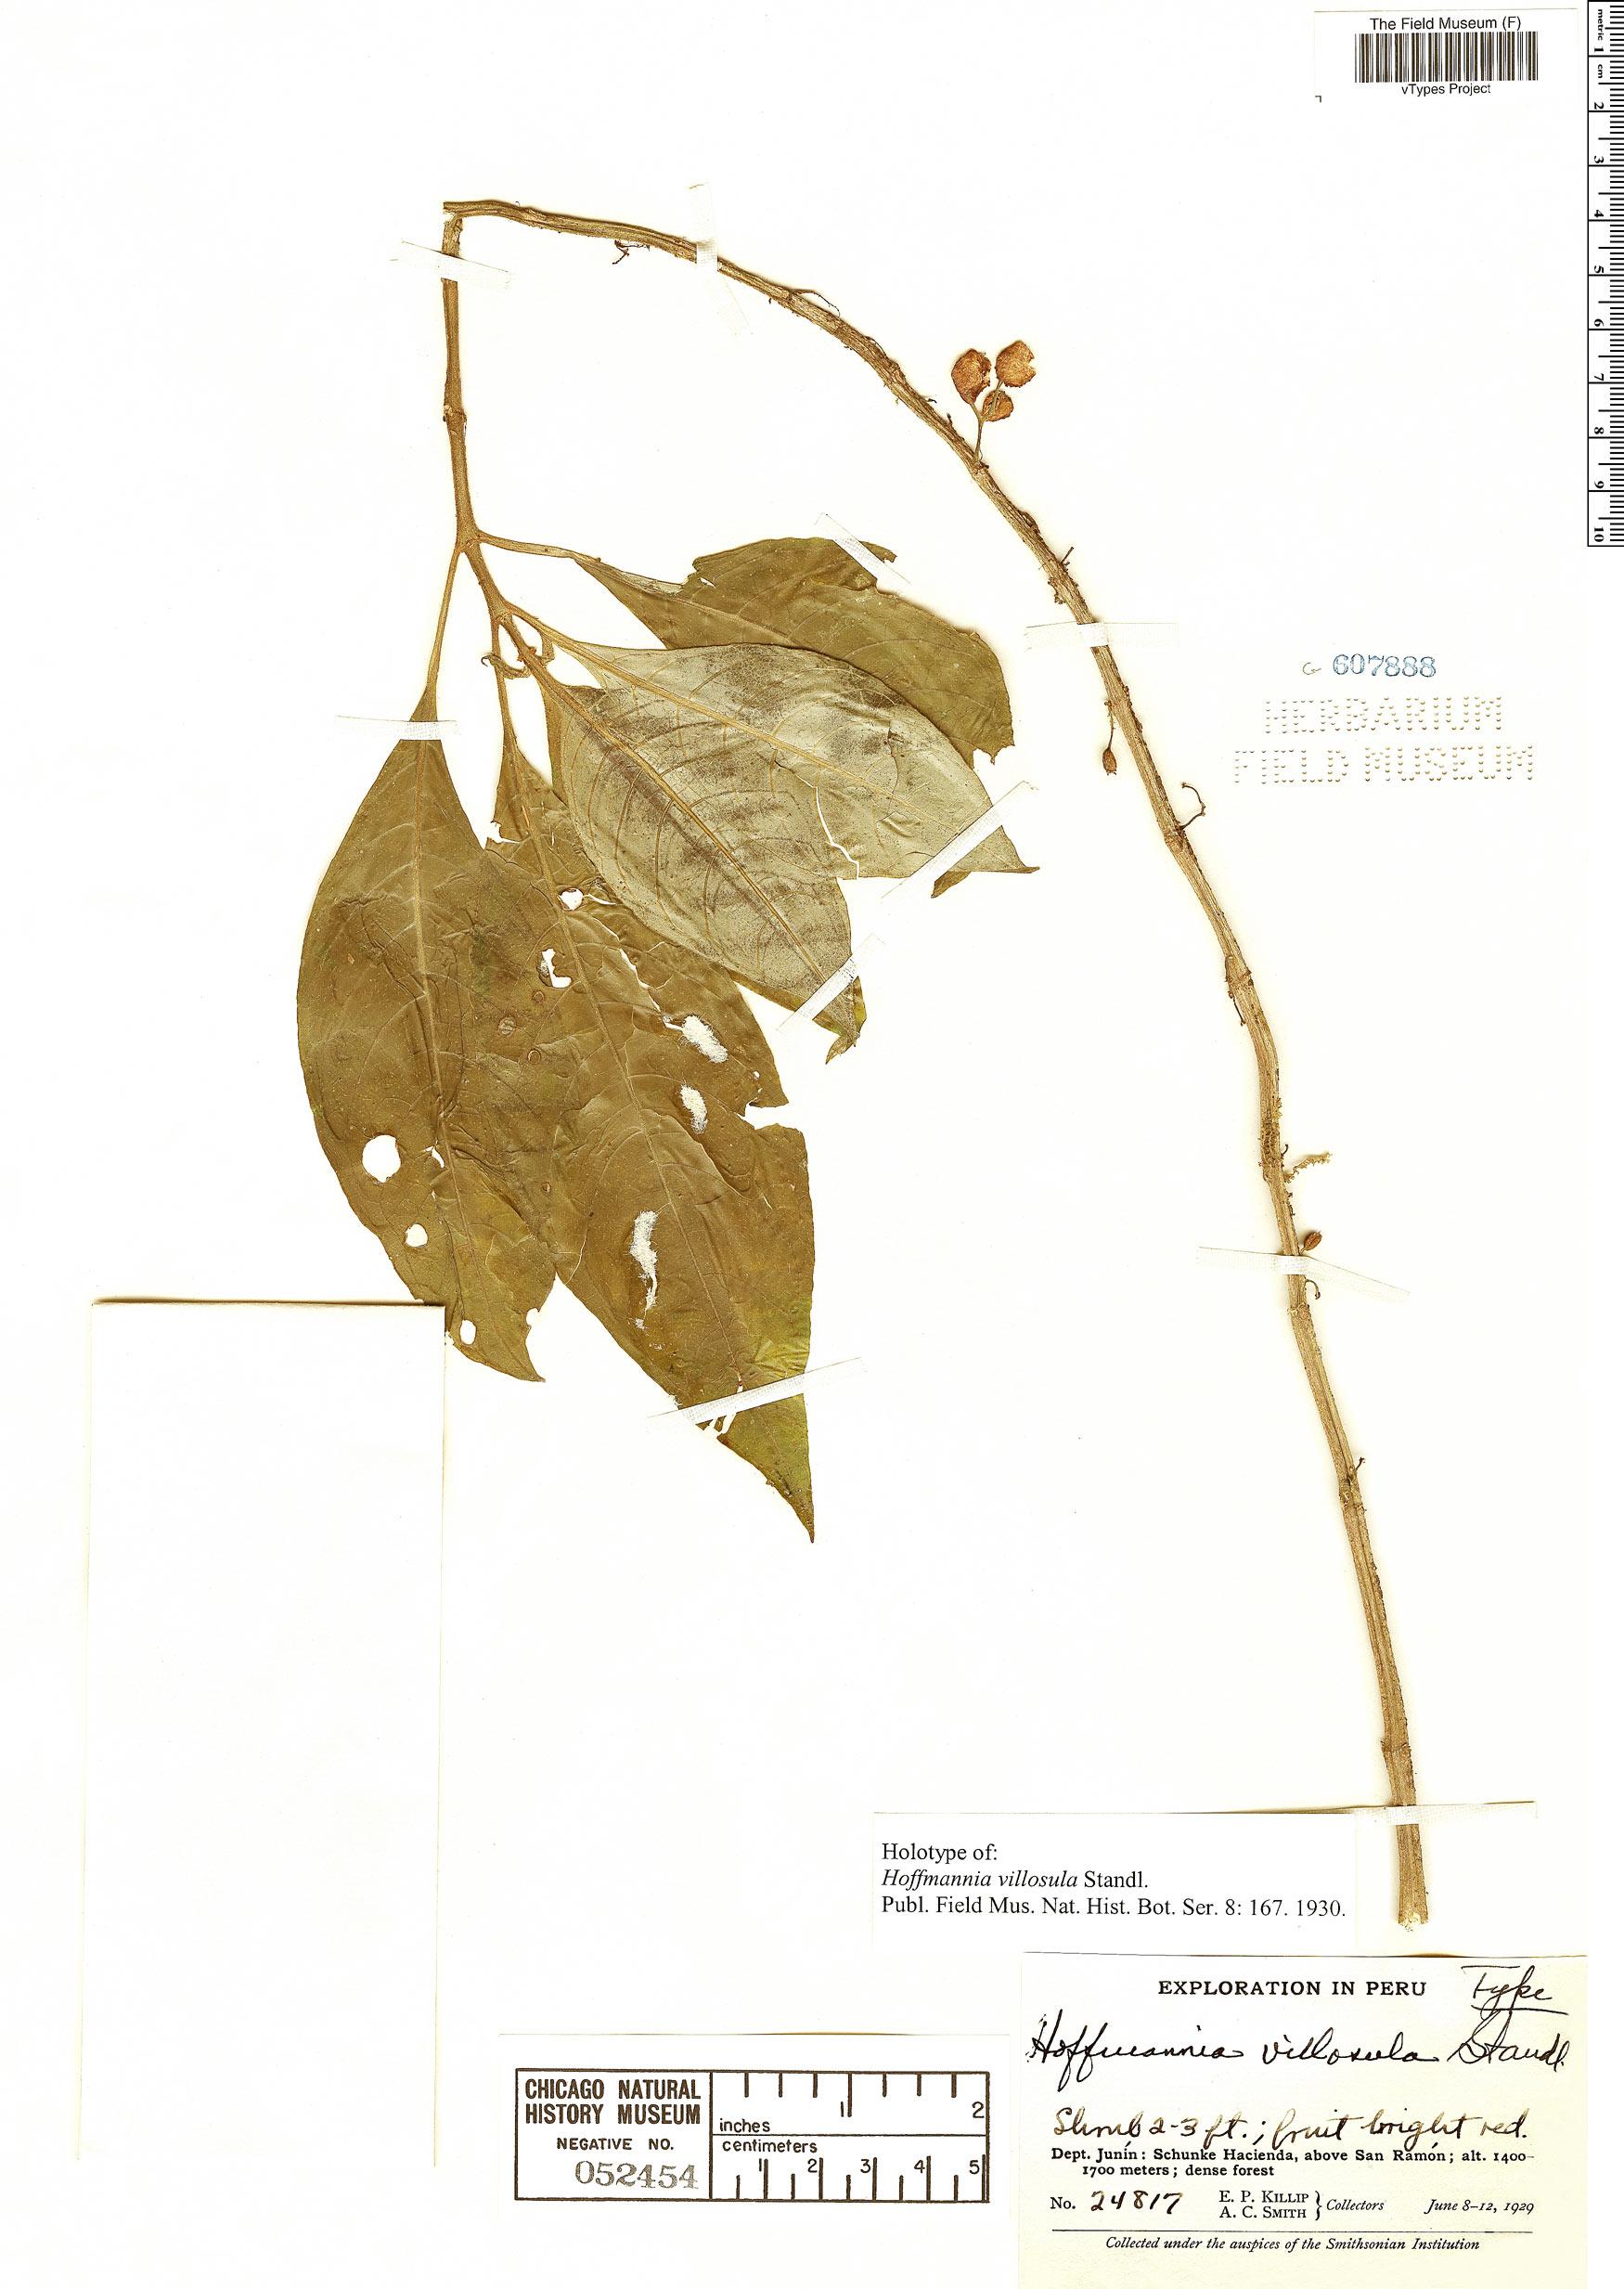 Espécimen: Hoffmannia villosula